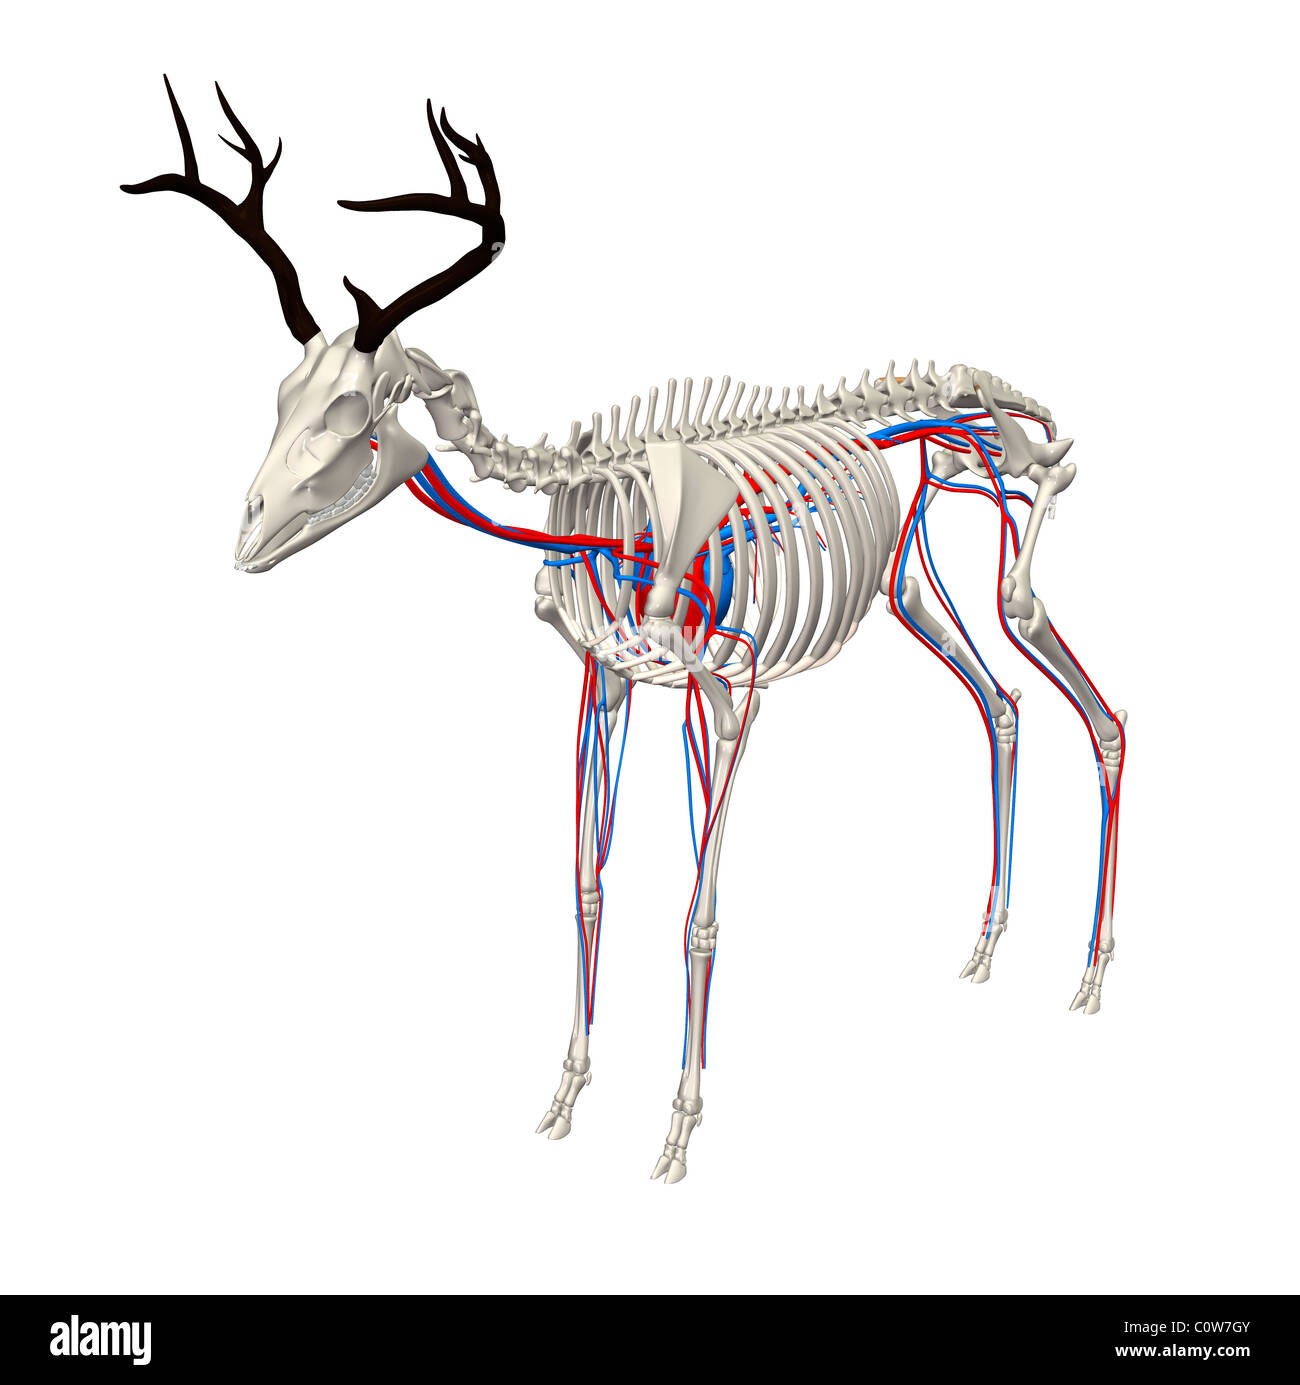 deer anatomy heart circulation skeleton Stock Photo: 34975499 - Alamy